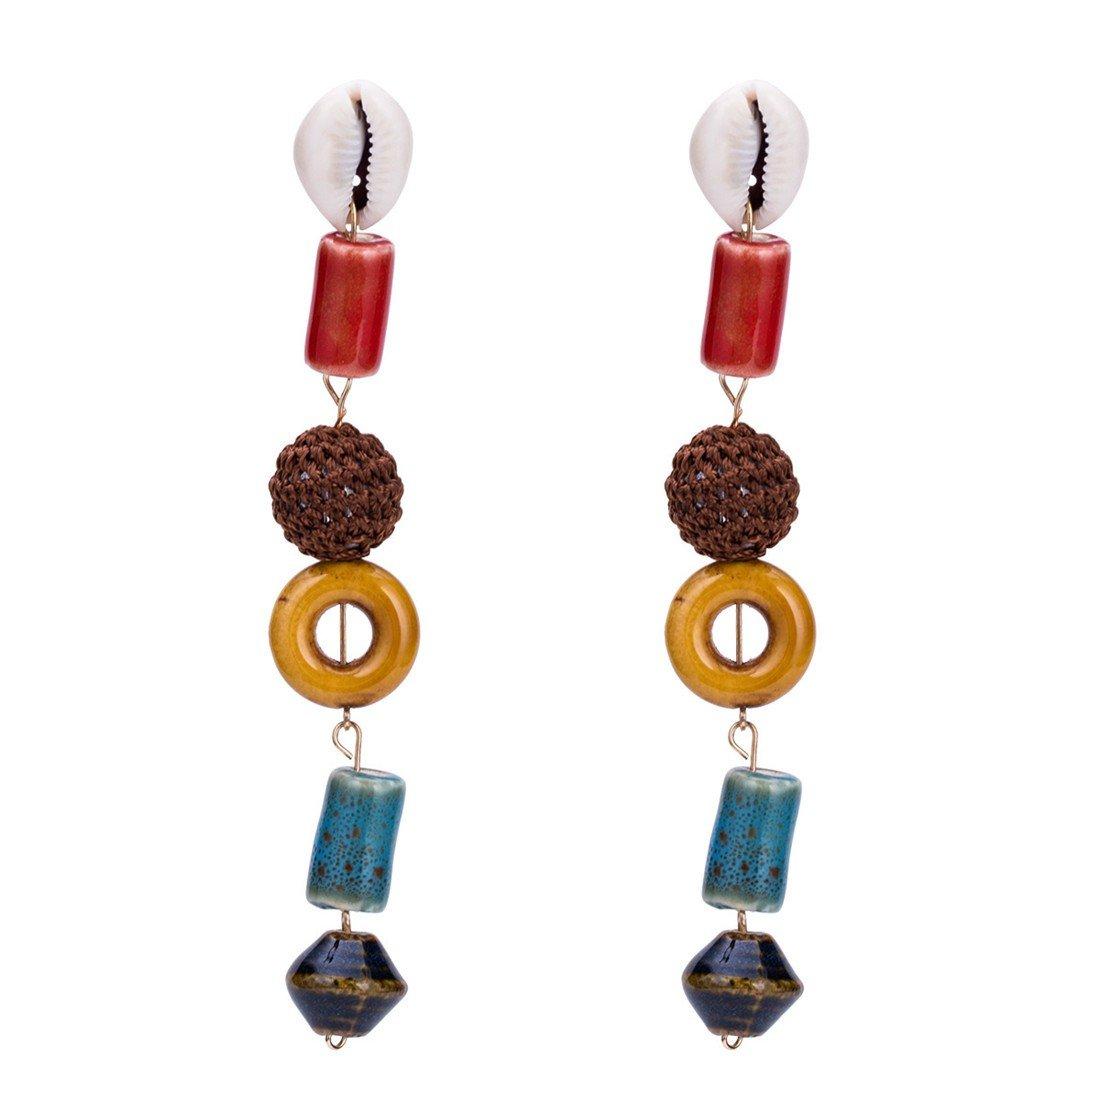 ball earrings clip on earrings ear cuffs dangle earrings earring jackets hoop earrings stud earrings Exaggerated earrings long knitted national wind studs. European and American earrings